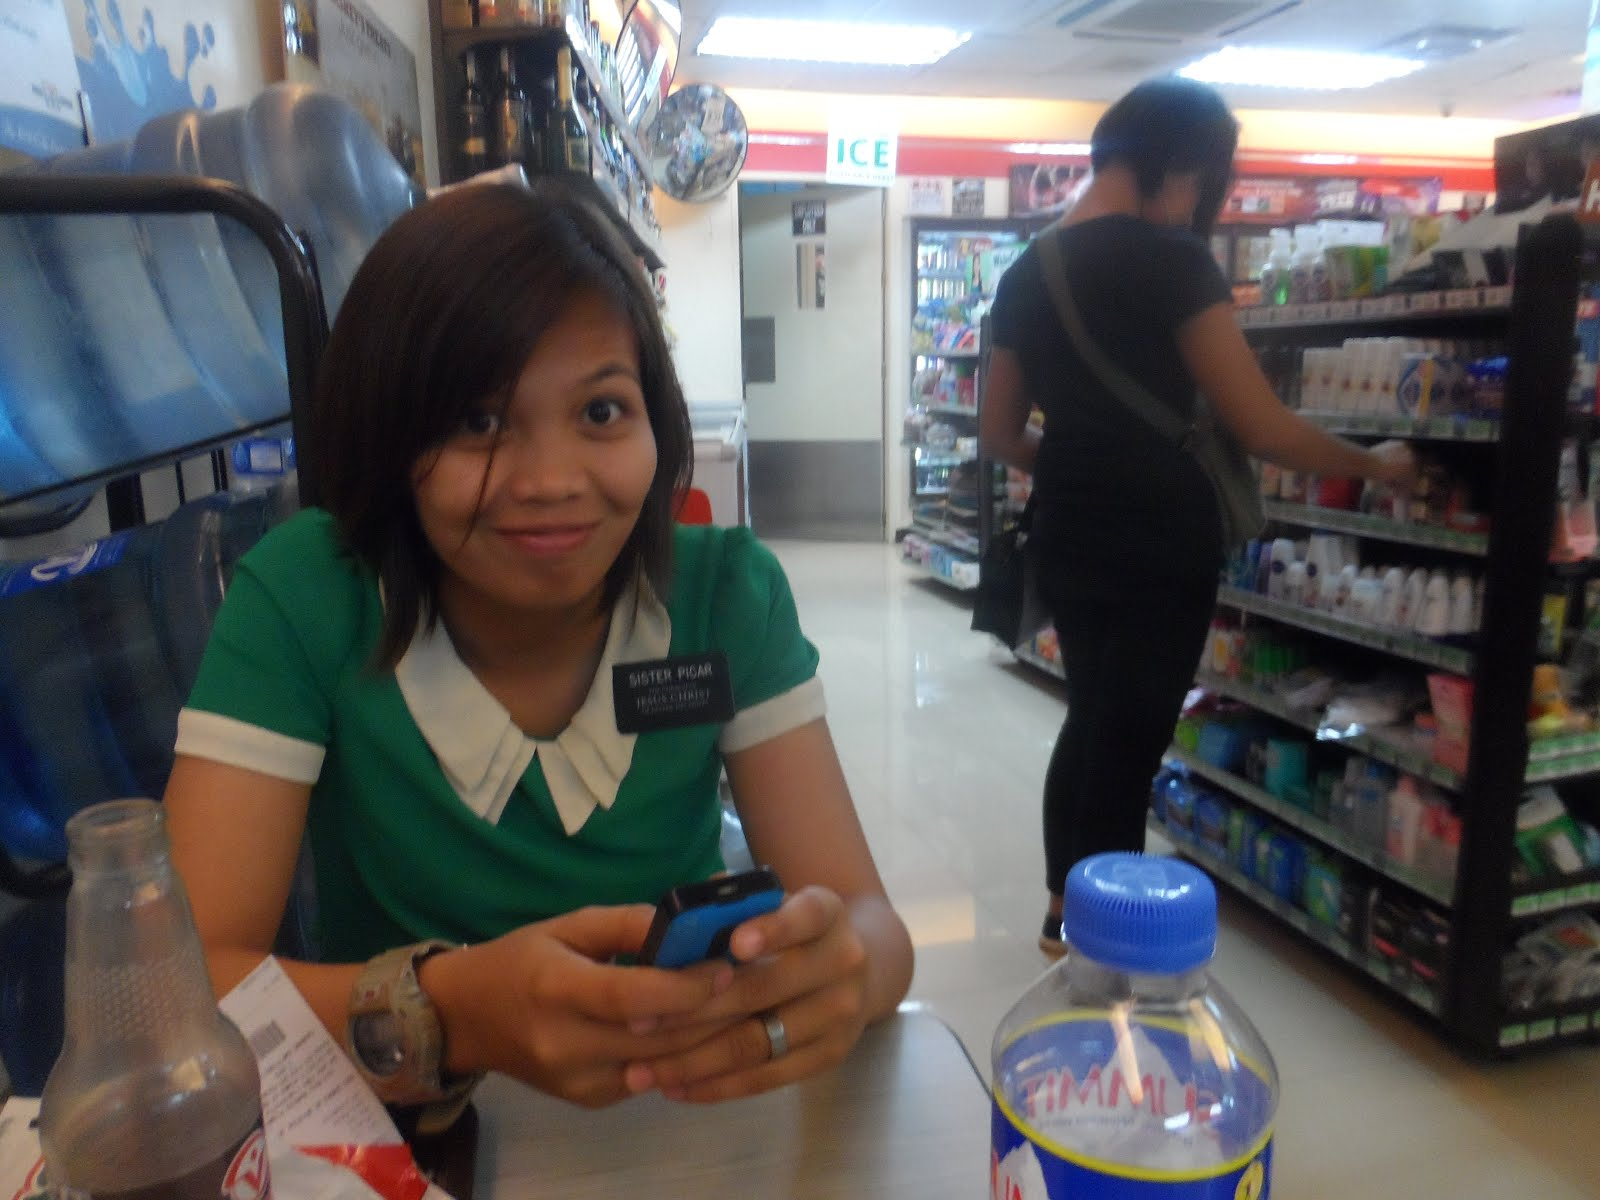 My companion Sister Picar